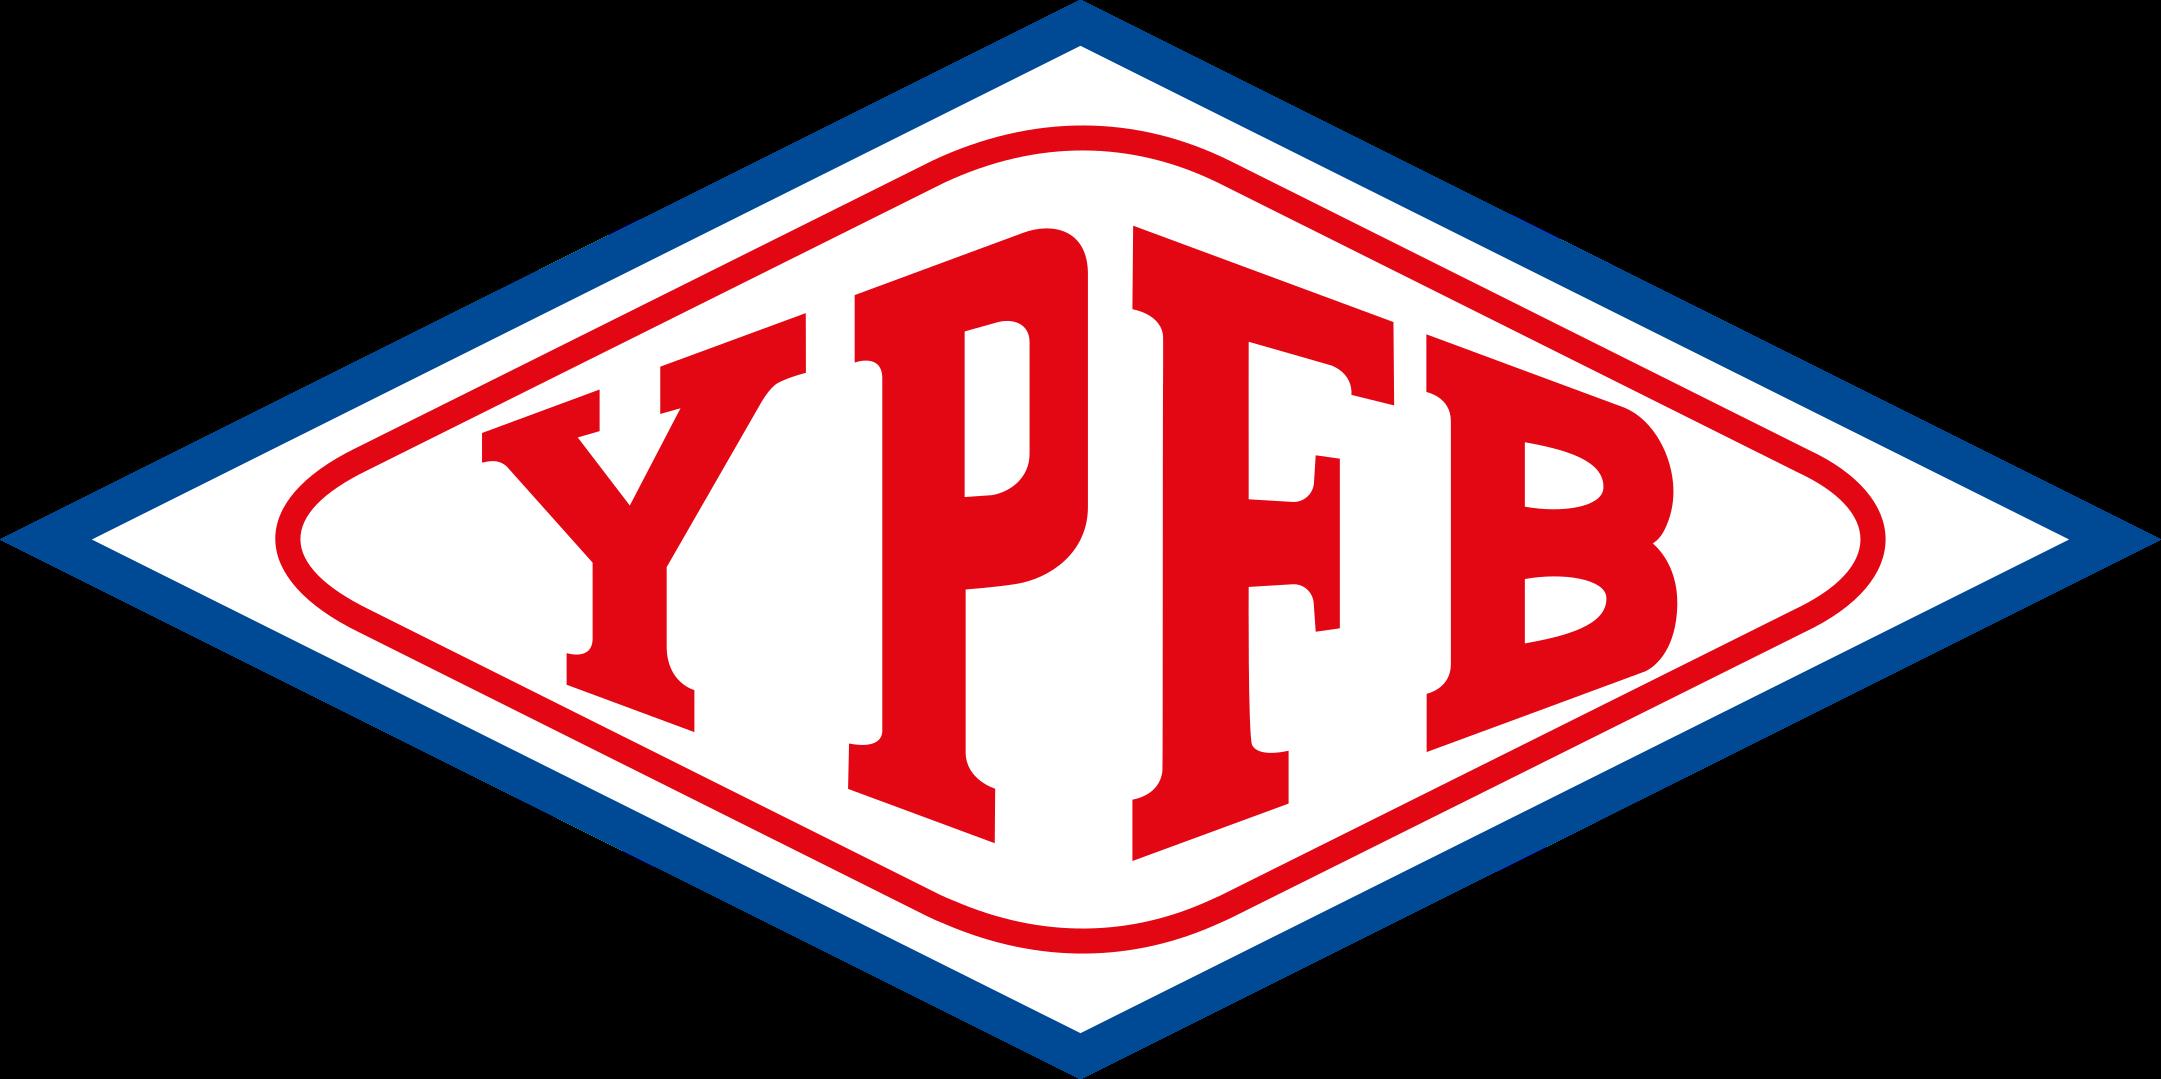 ypfb logo 1 - YPFB Logo